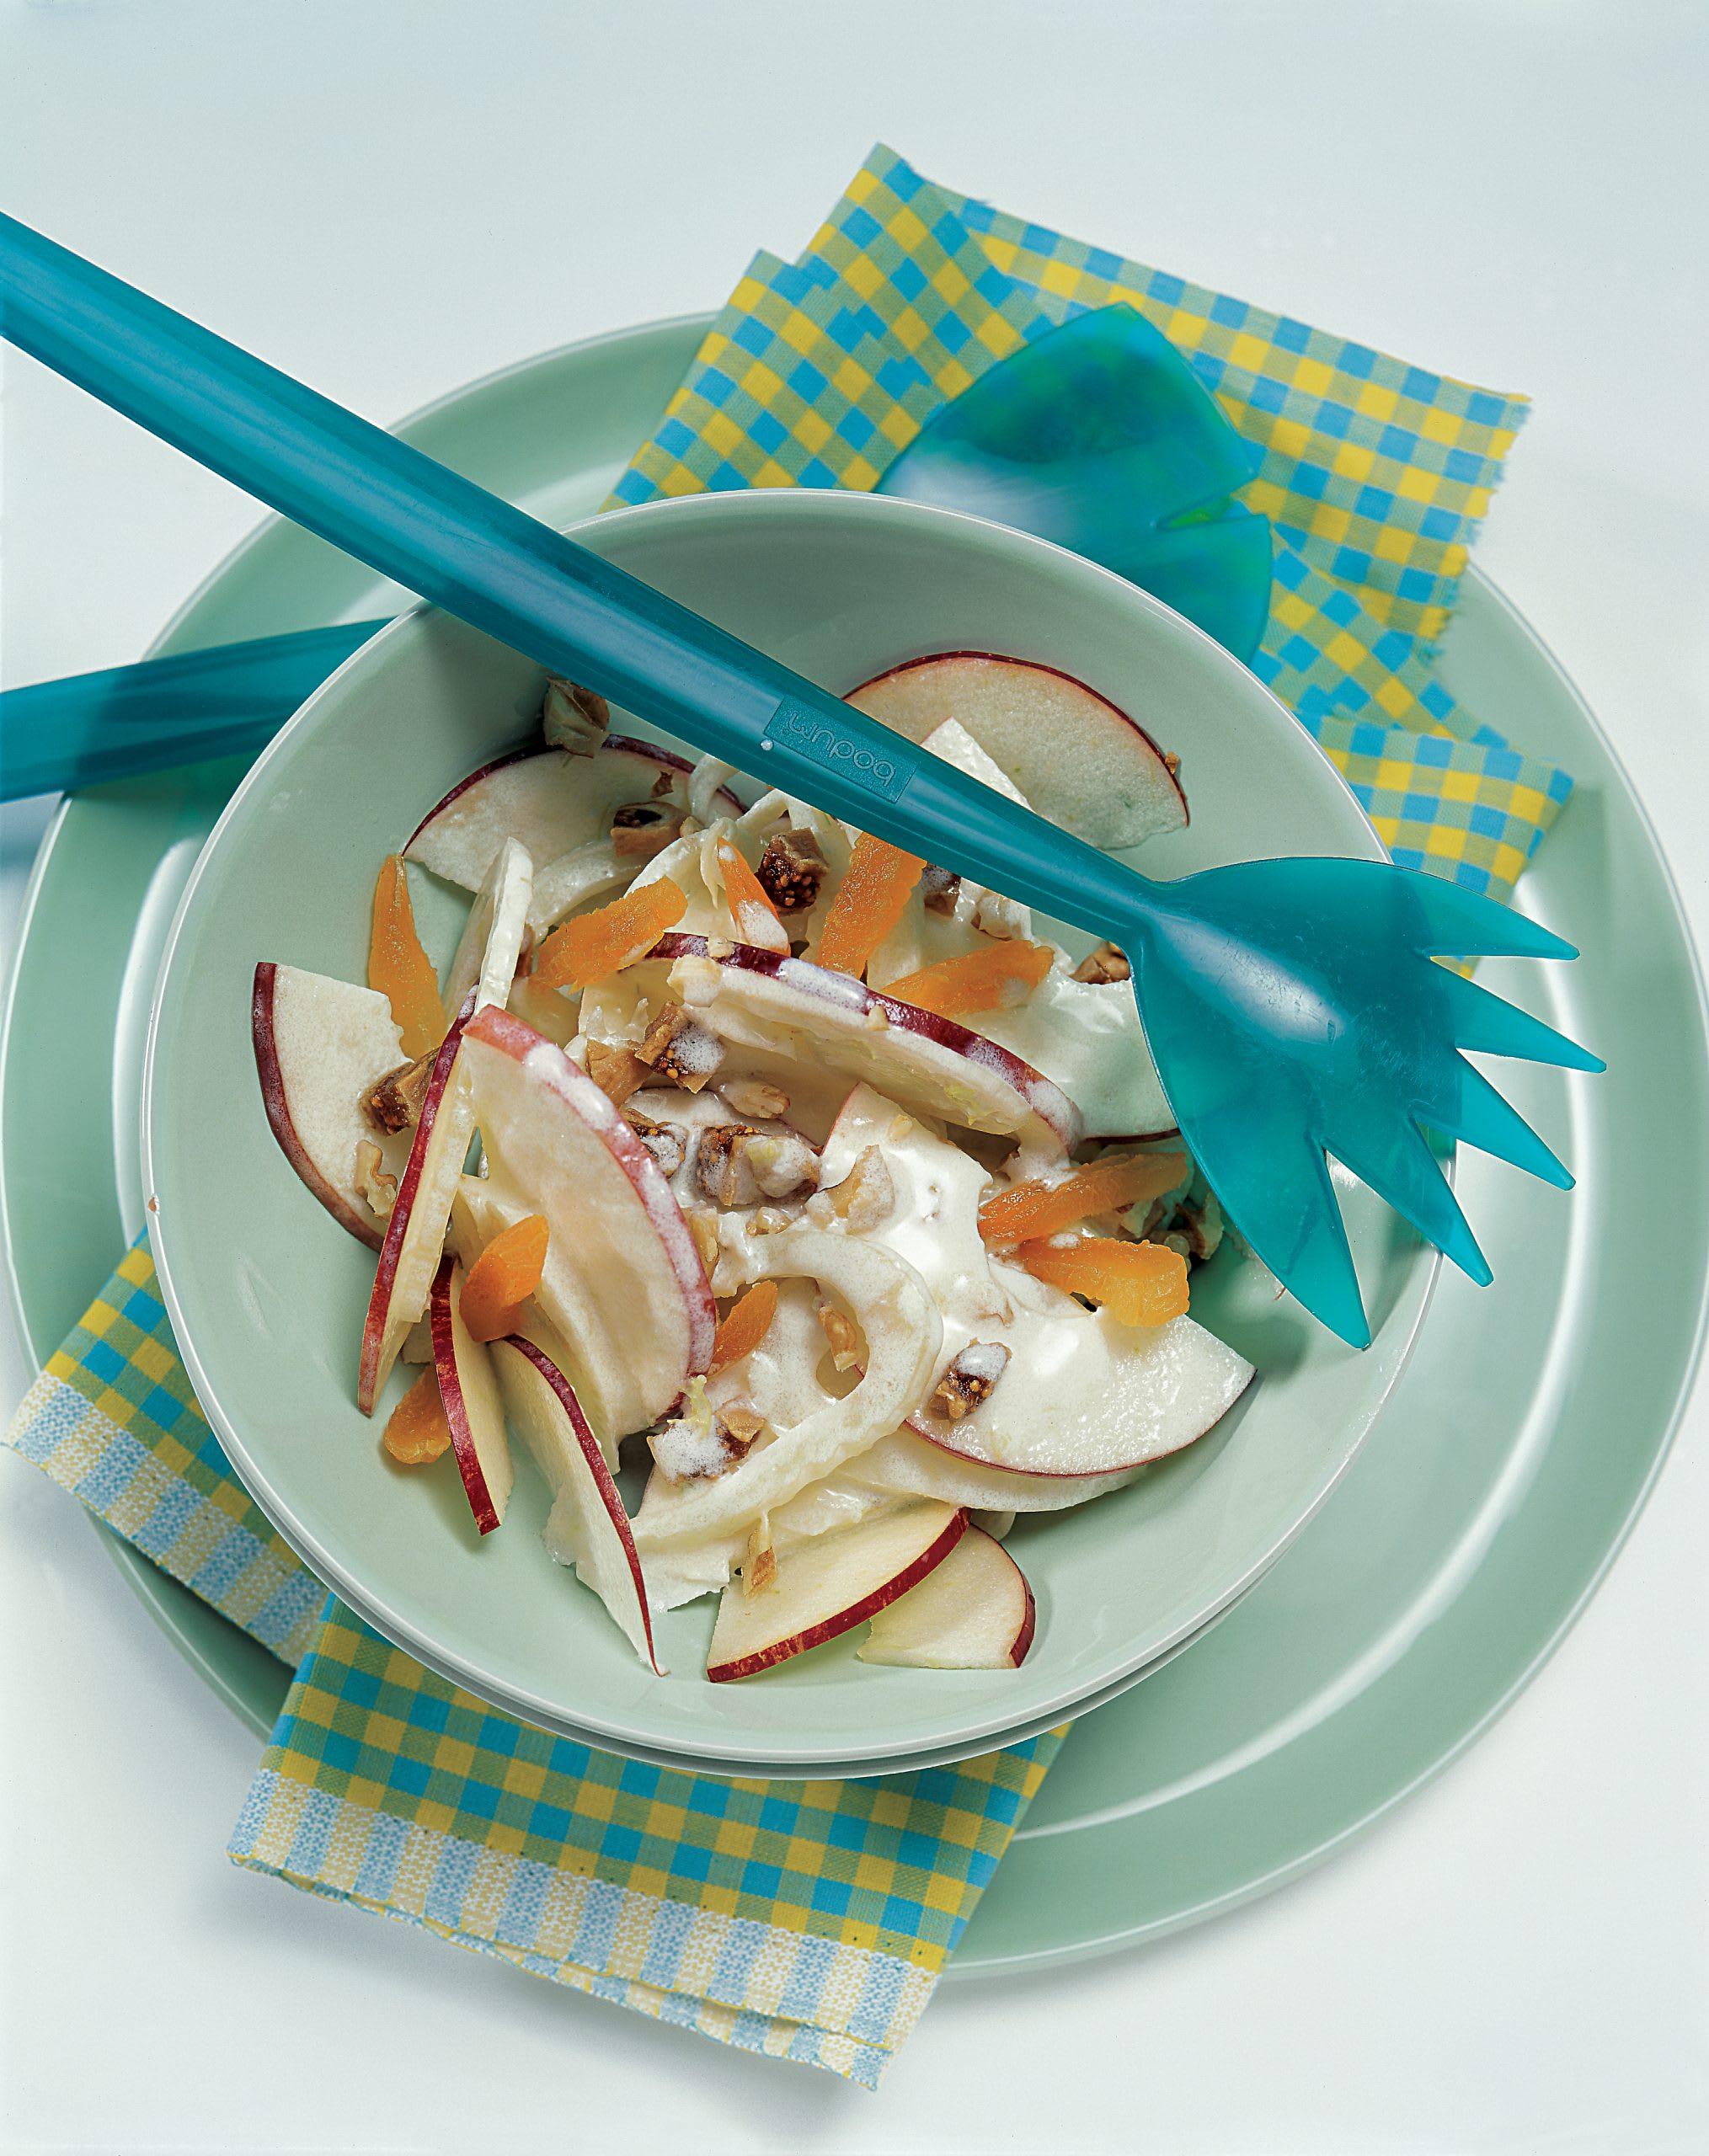 Salade pommes et fenouil